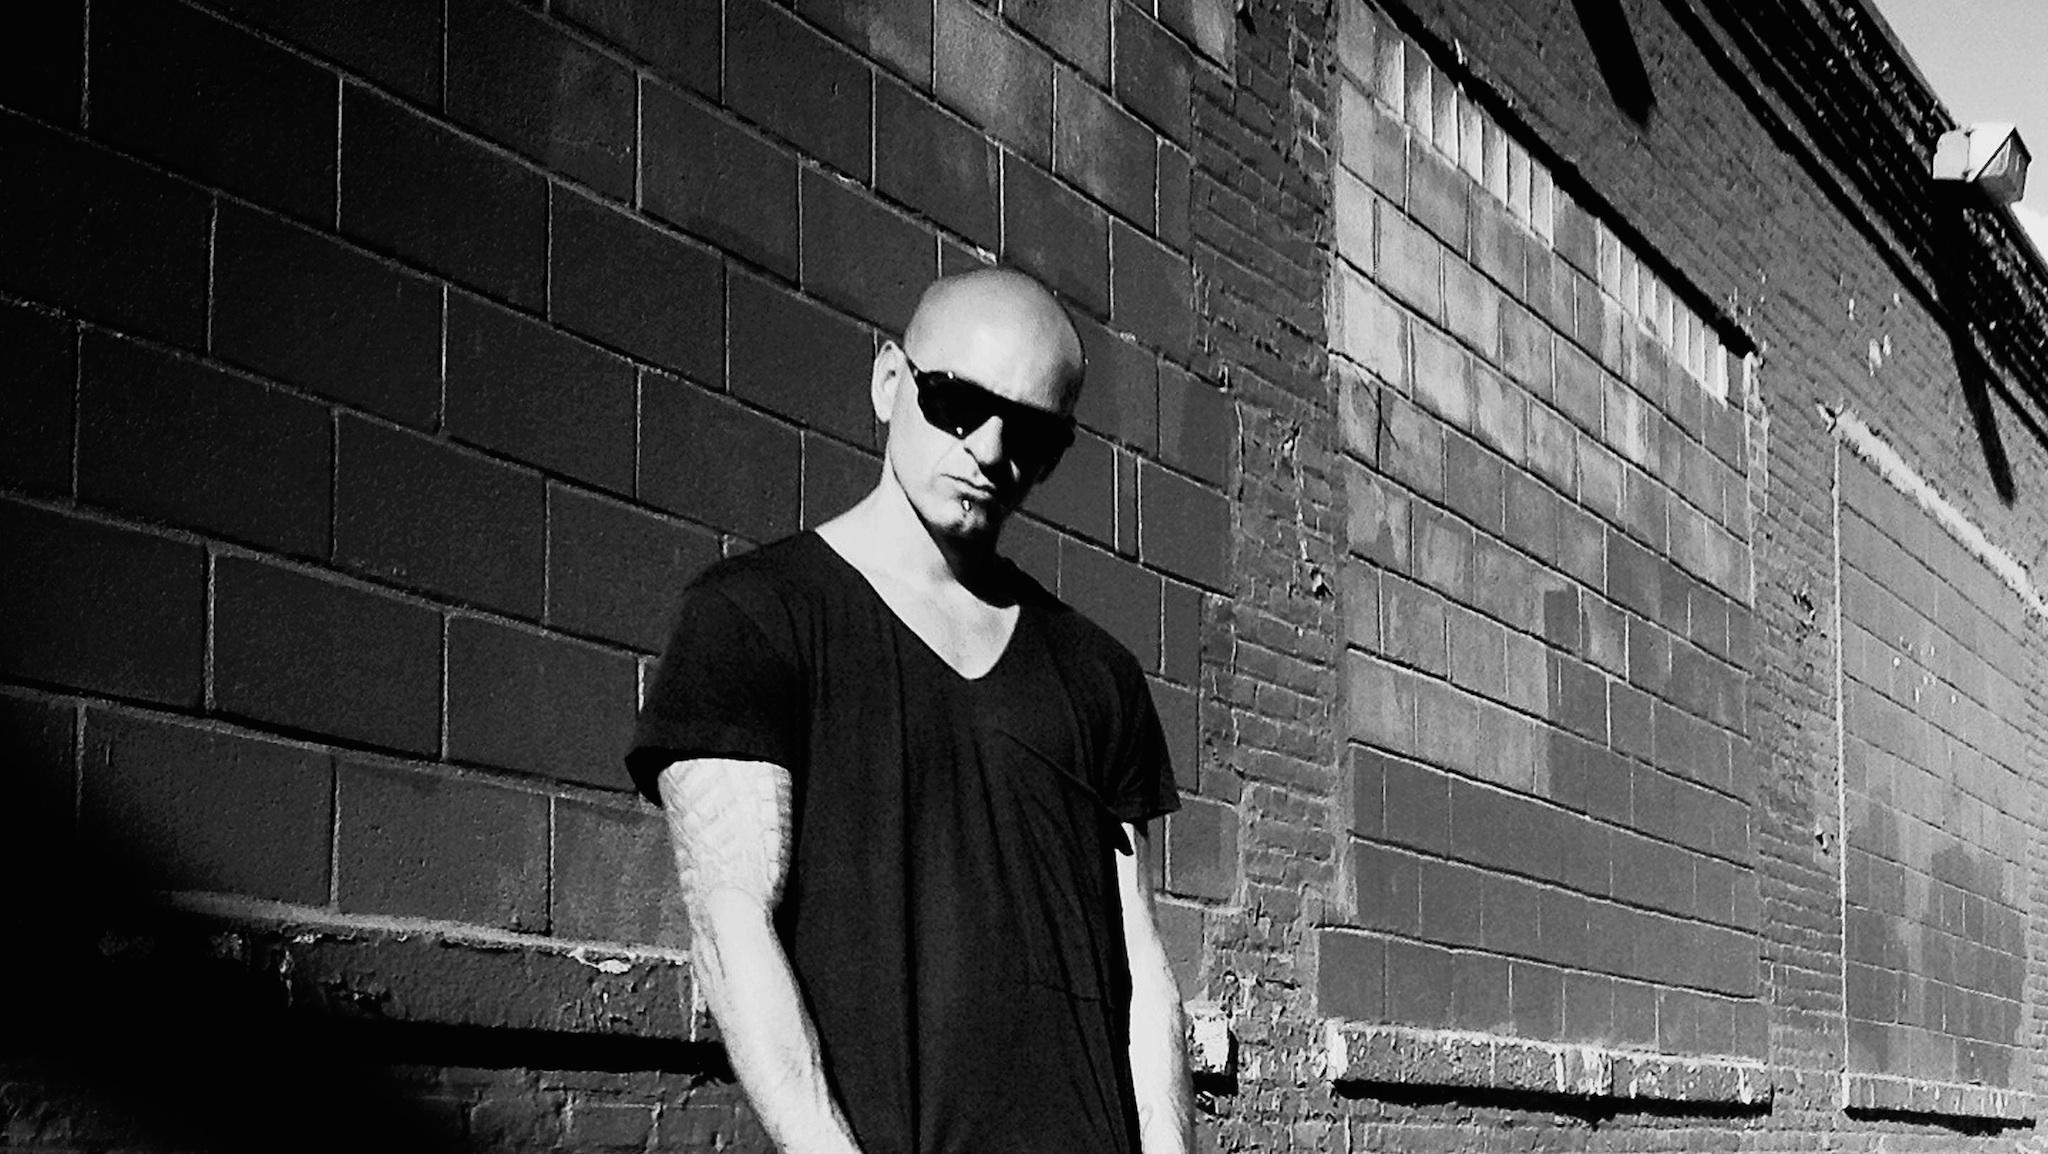 Victor Calderone - Brooklyn 2012